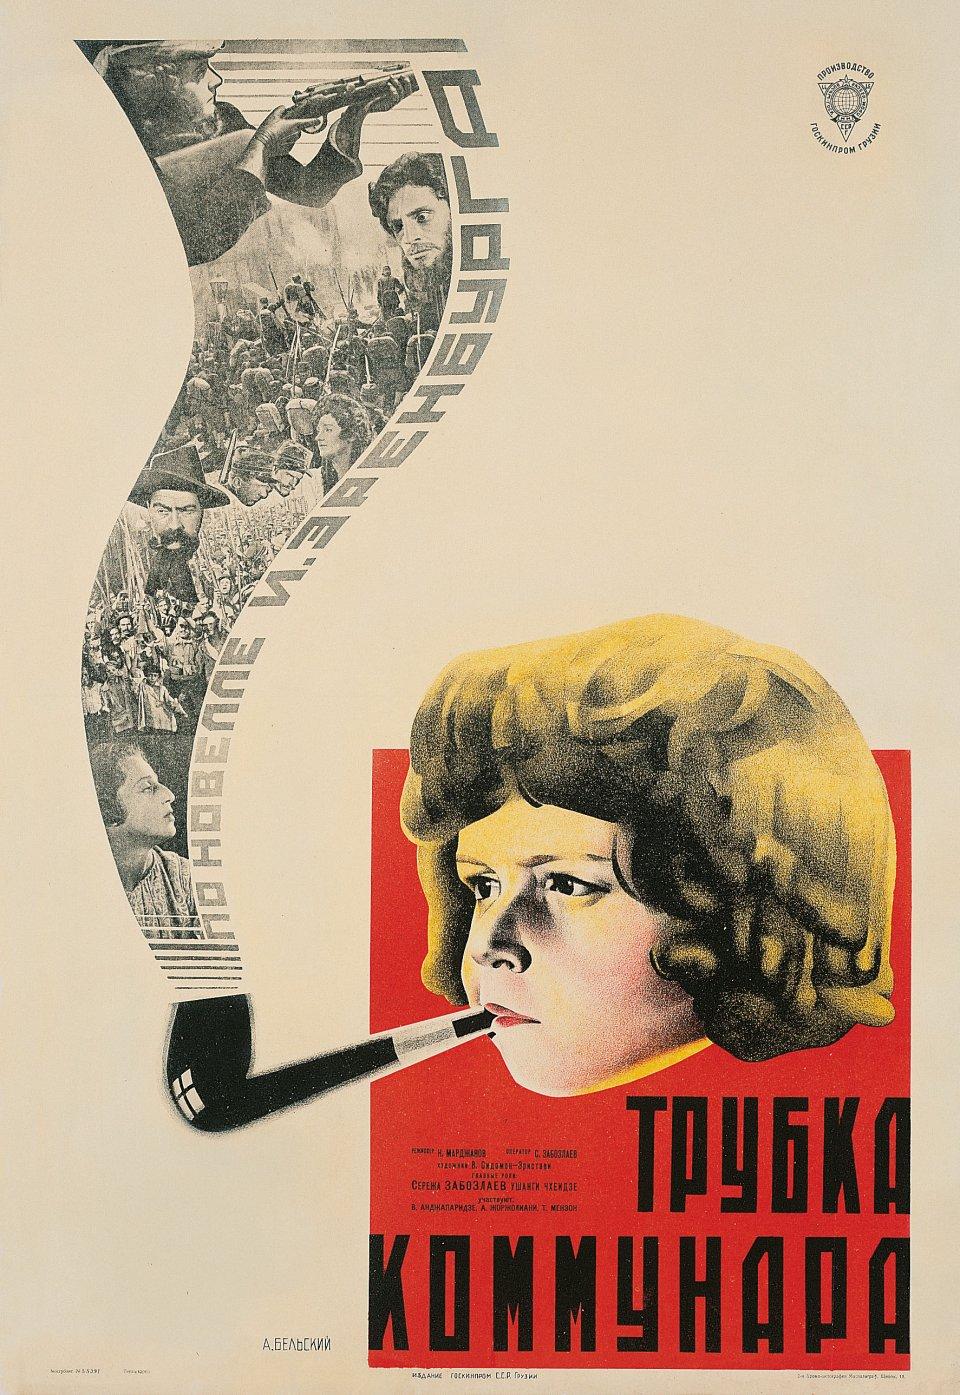 Copyright: © TASCHEN / Susan Pack, California | S. 17 | Anatoly Belsky, Film poster for Trubka Kommunard, 1929